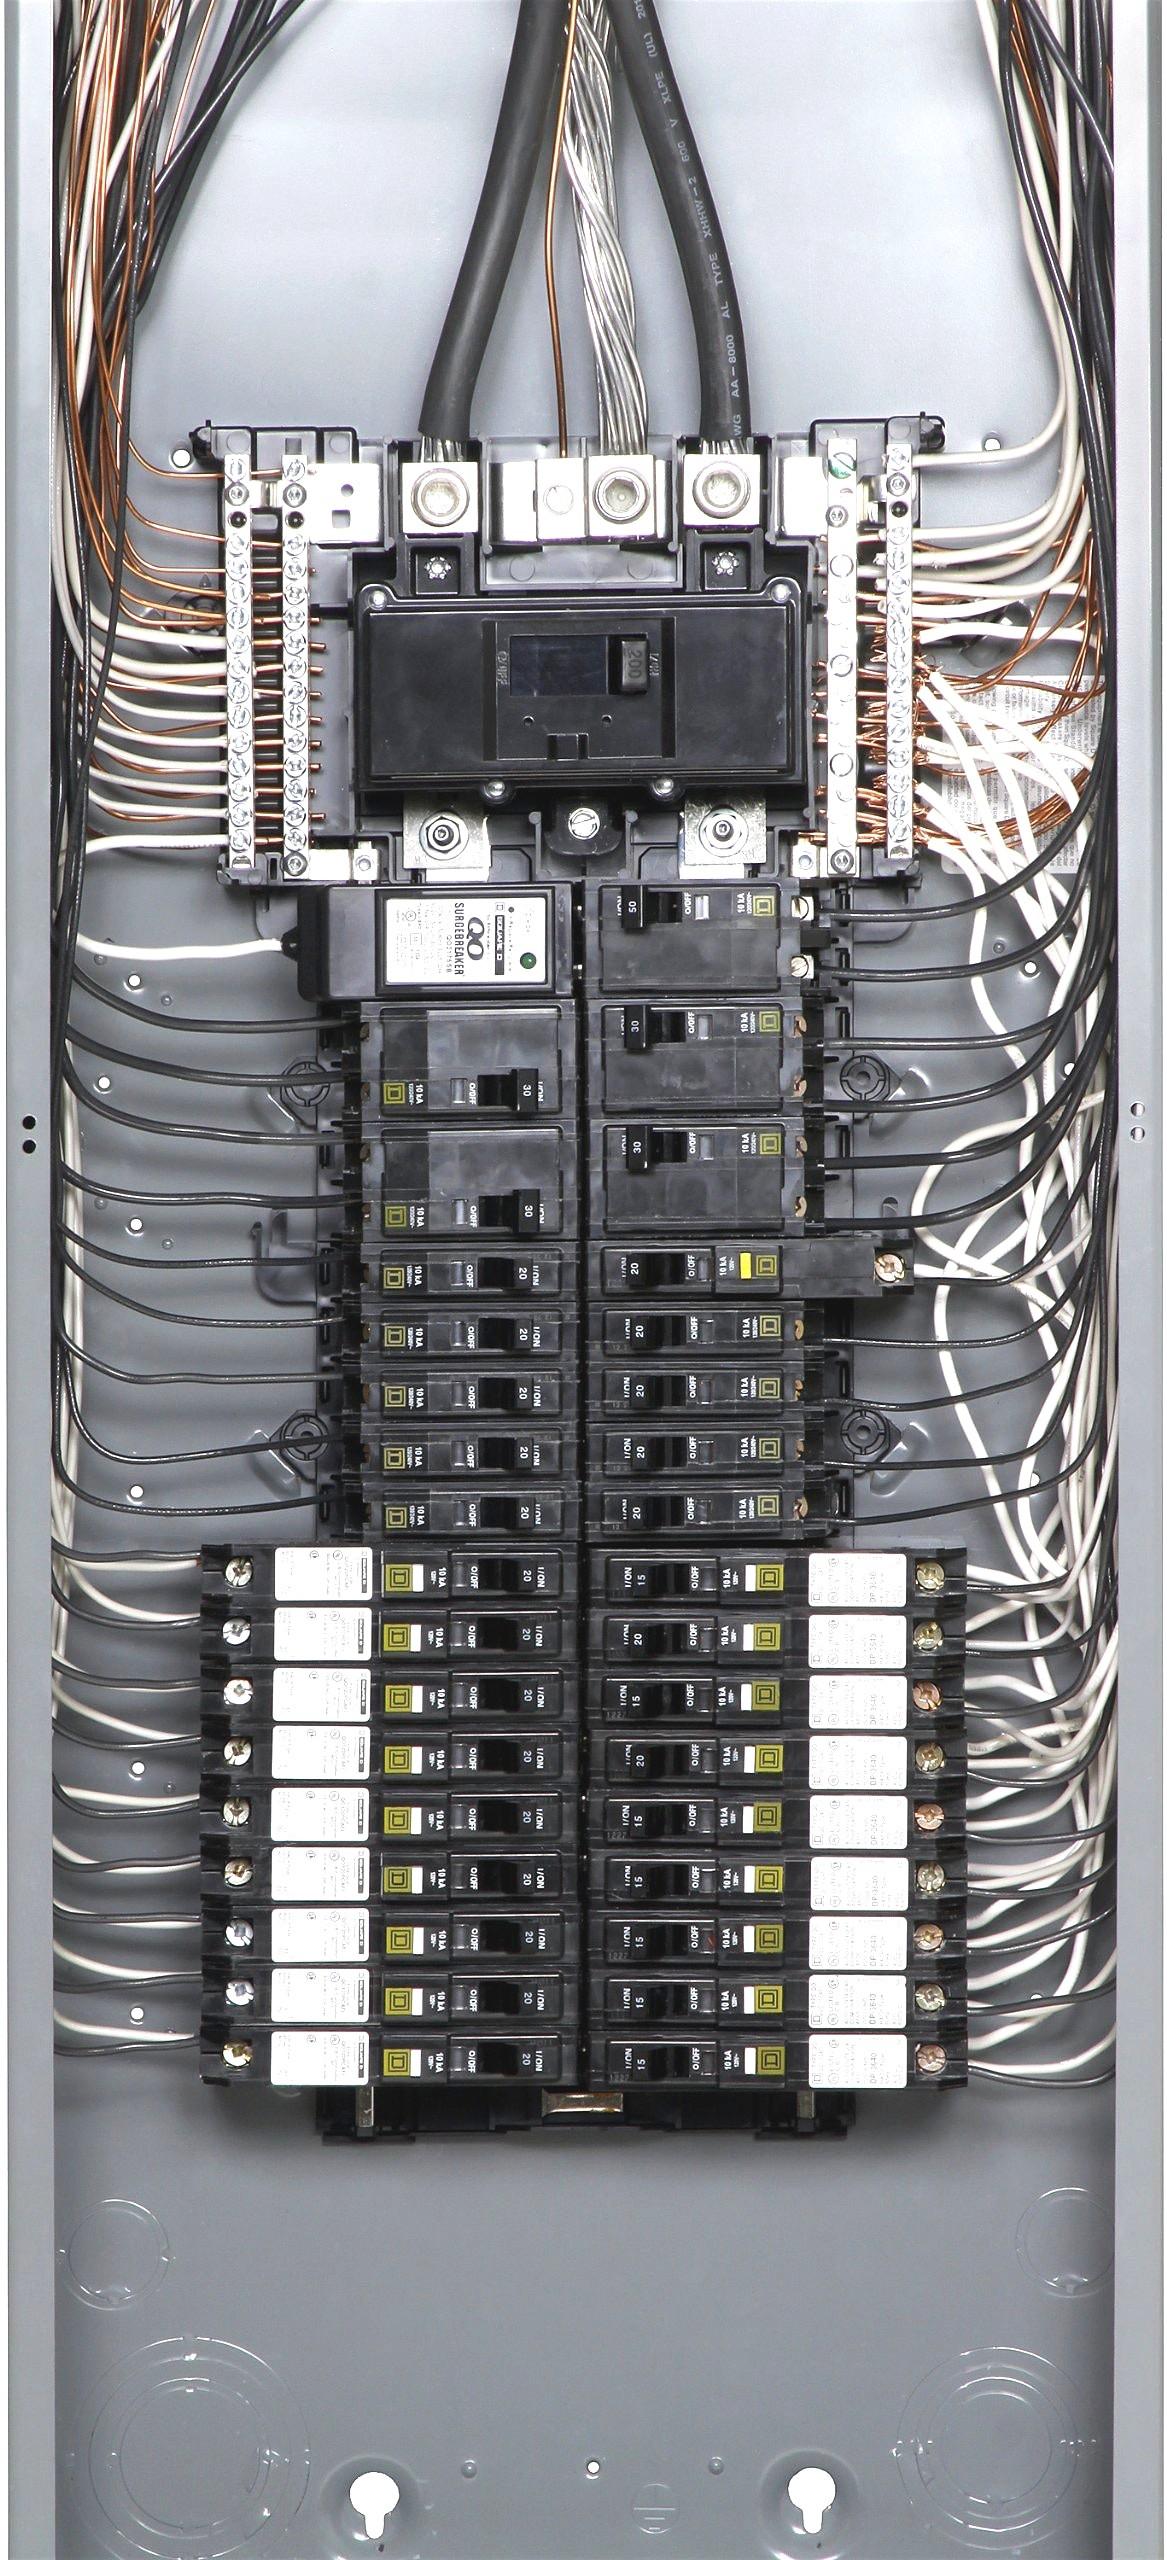 Square D Load Center Wiring Diagram Double Tap1 Jpg Beauteous Homeline